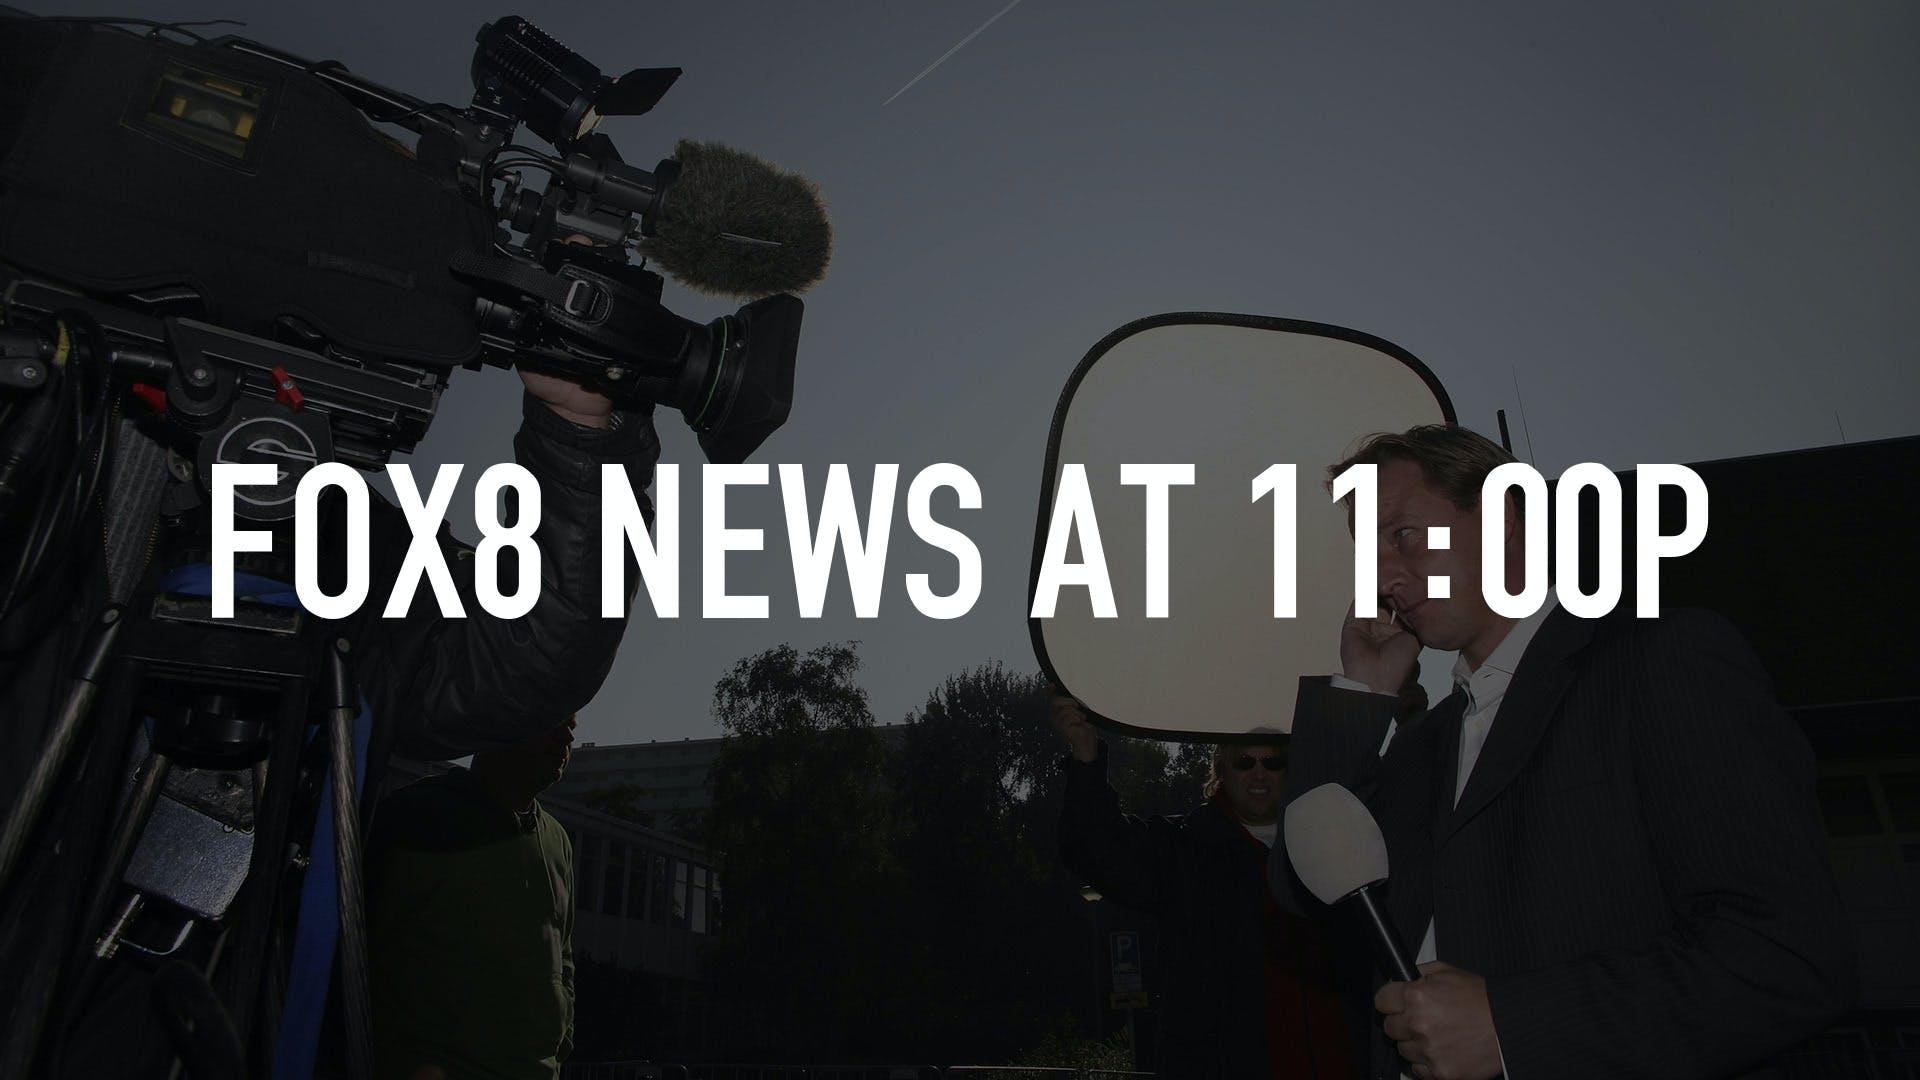 Watch Fox8 News at 11:00P | Stream on fuboTV (Free Trial)